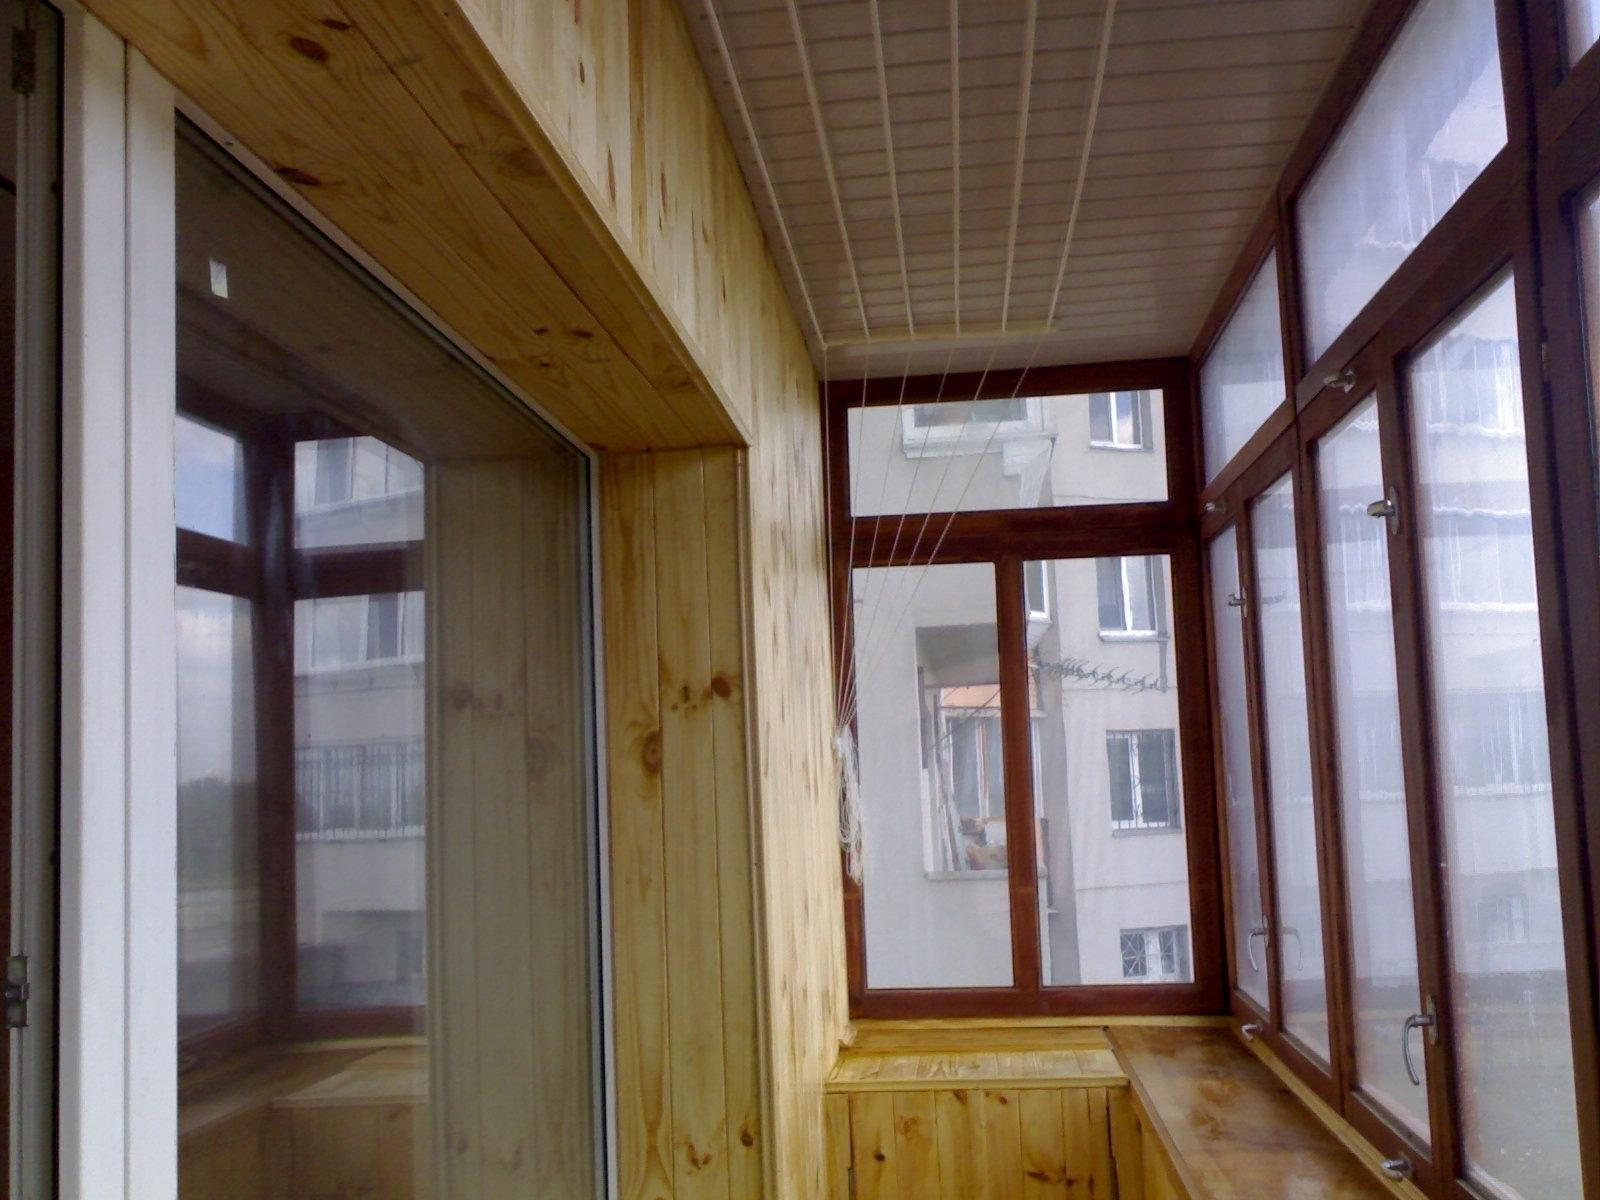 Отделка балконов и лоджий под ключ. фото, идеи, цены..